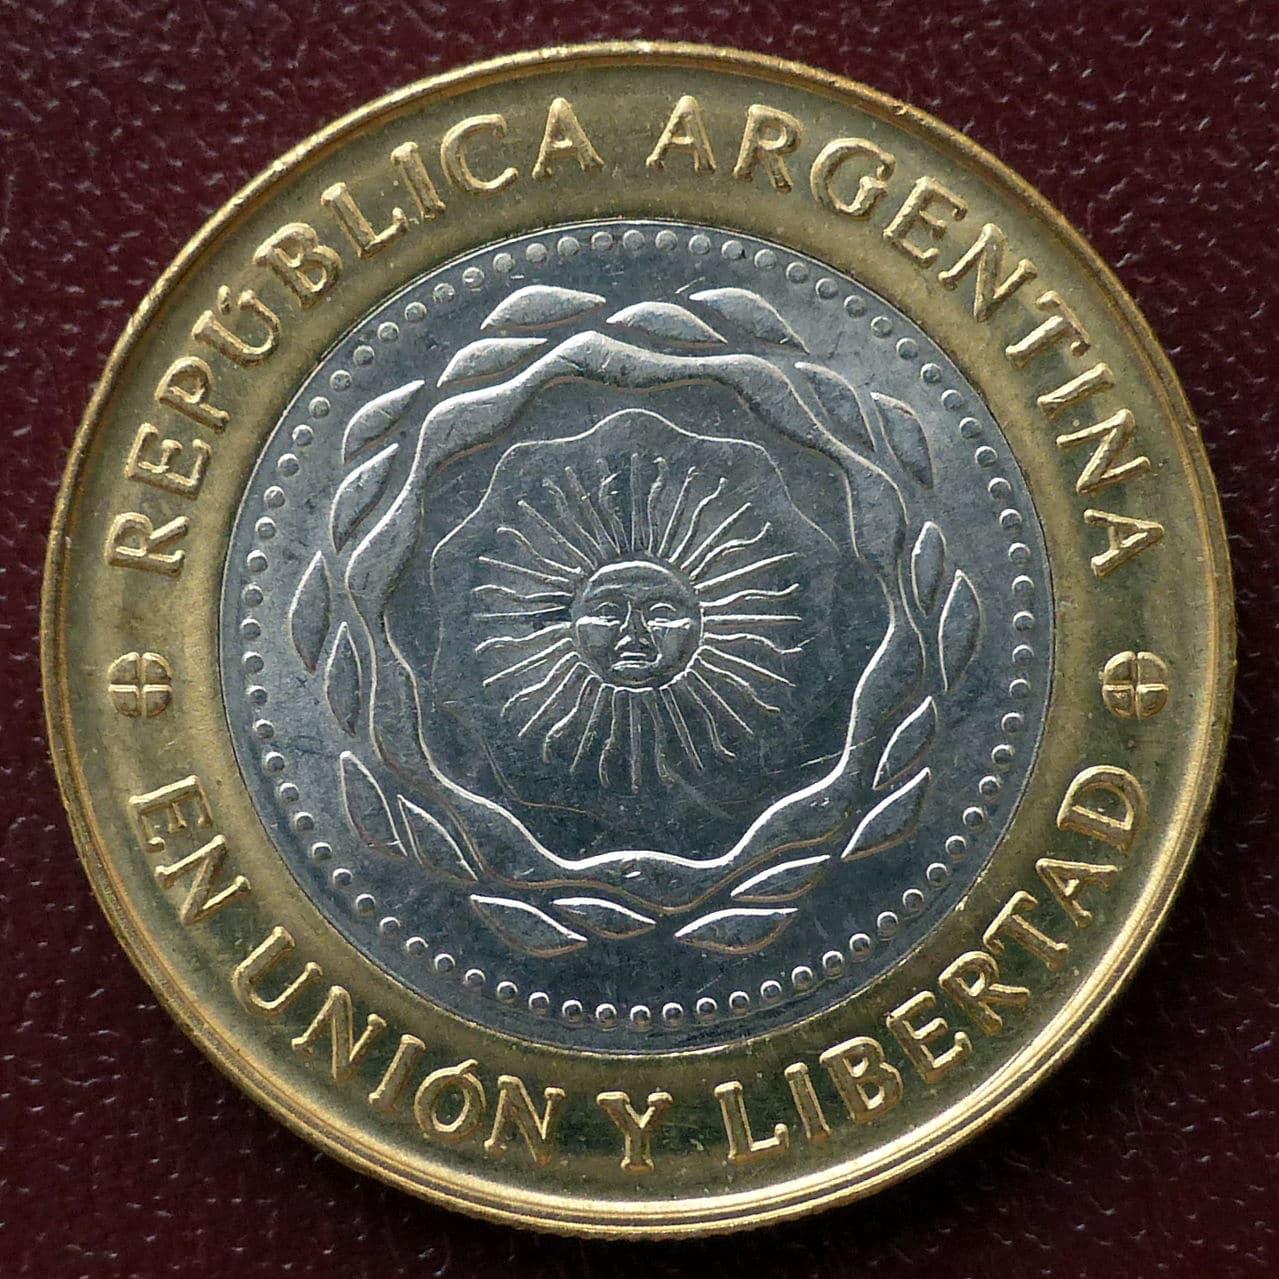 Argentina - Serie 1 peso - Bicentenario 2rev